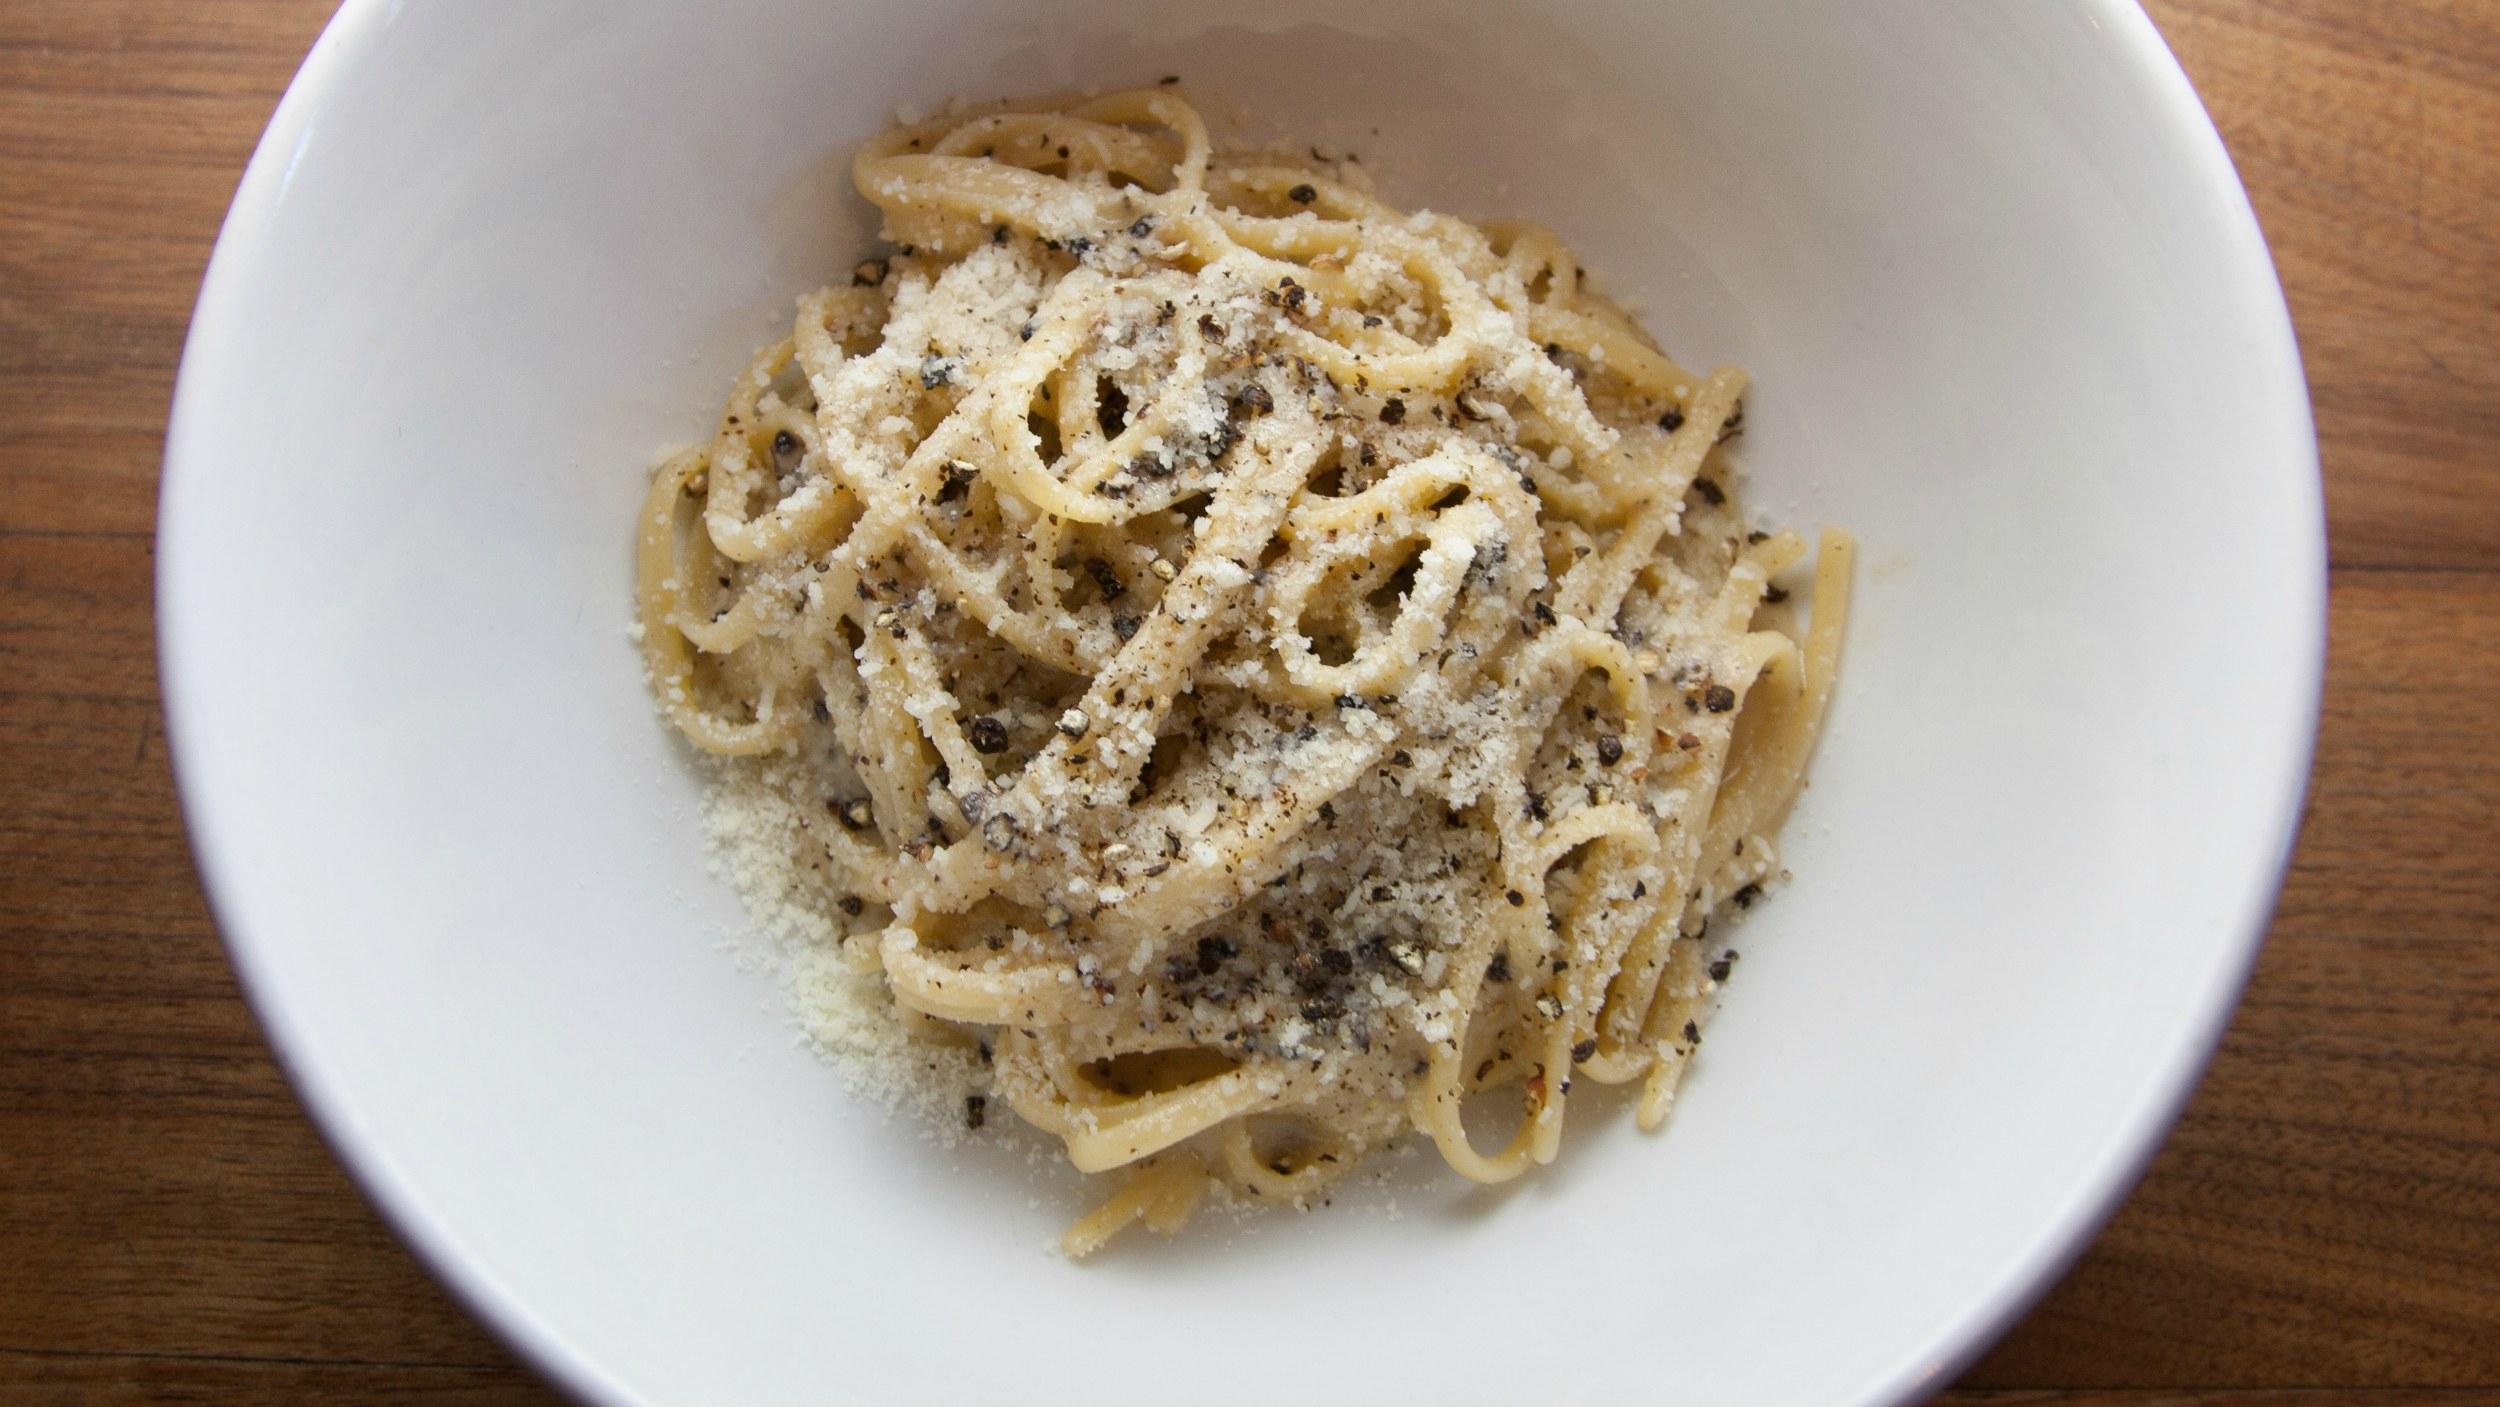 sl-epicerie-fine-nice-italienne-pates-fomage-poivre-recette